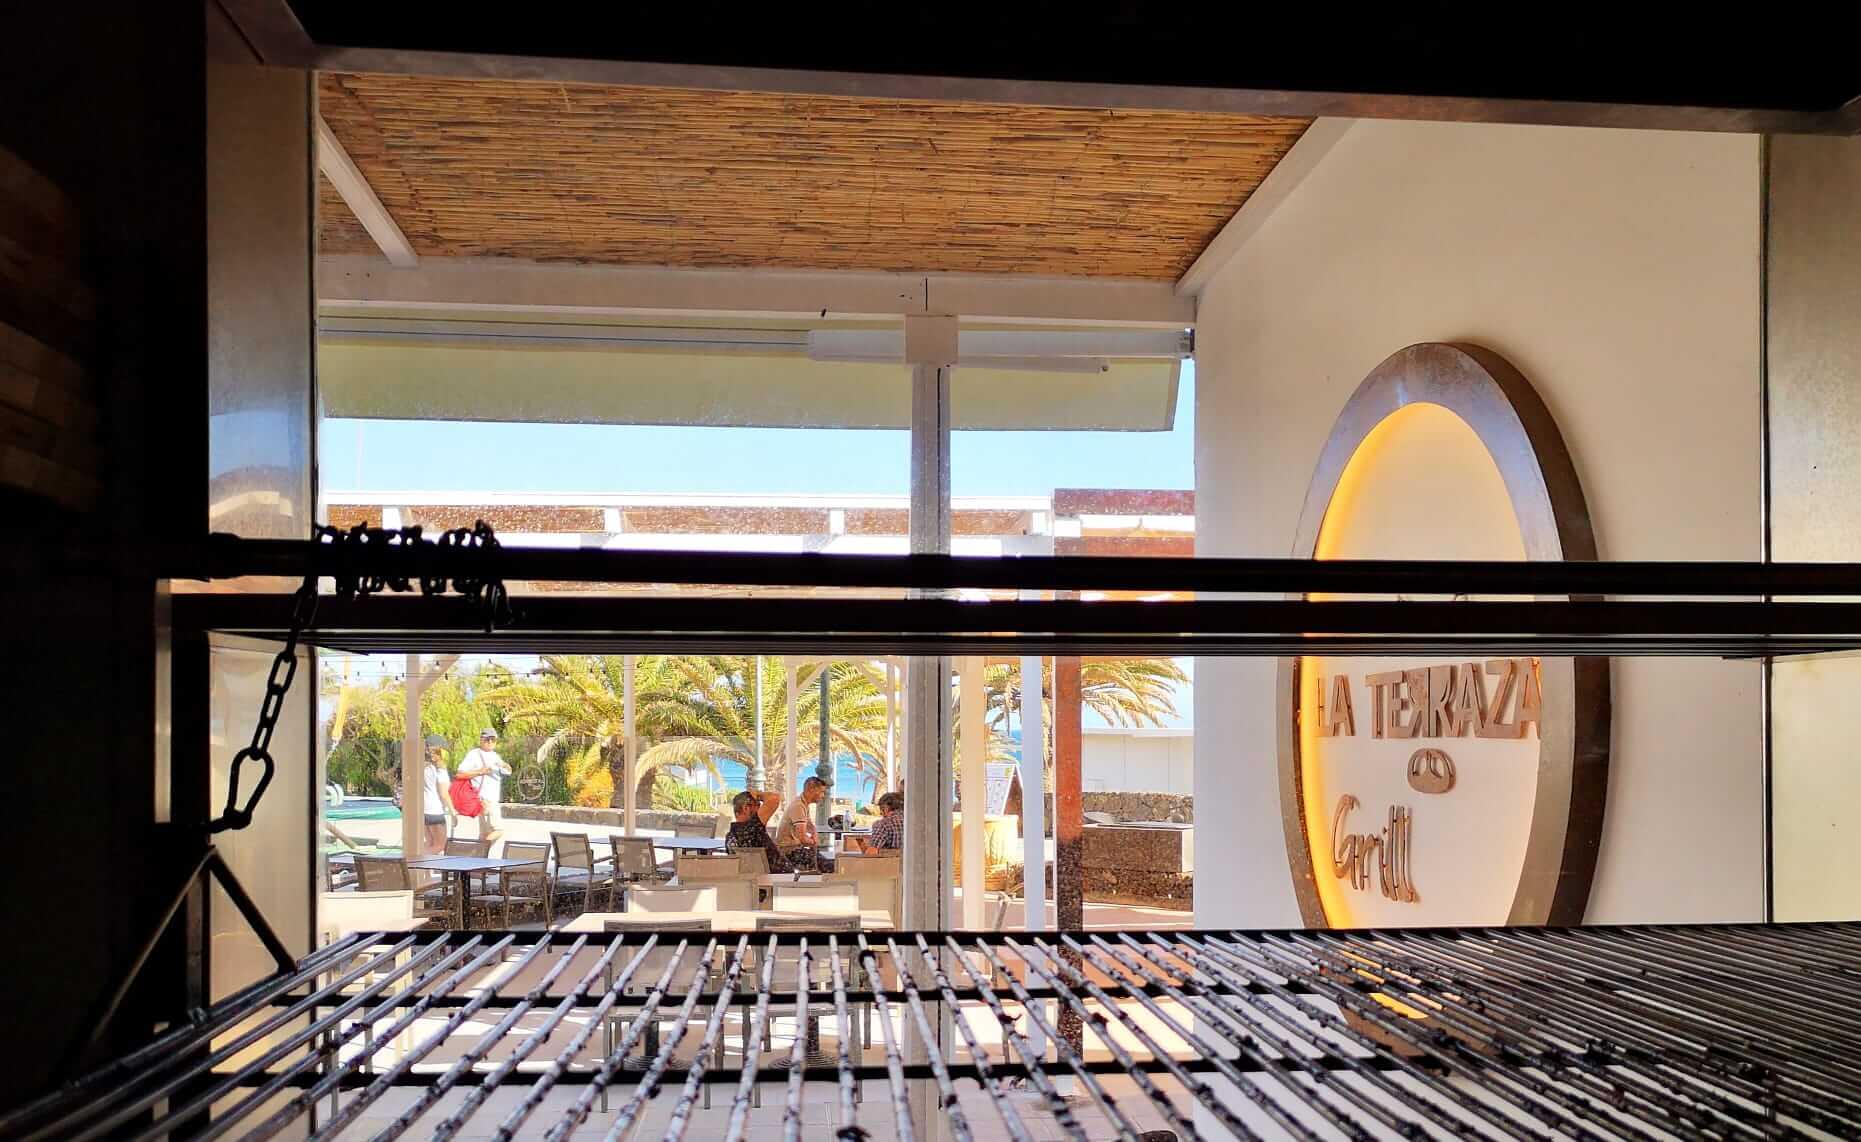 El grill va a ser la esencia de La Terraza Grill de Costa Teguise Dónde Comer en Costa Teguise al lado del mar